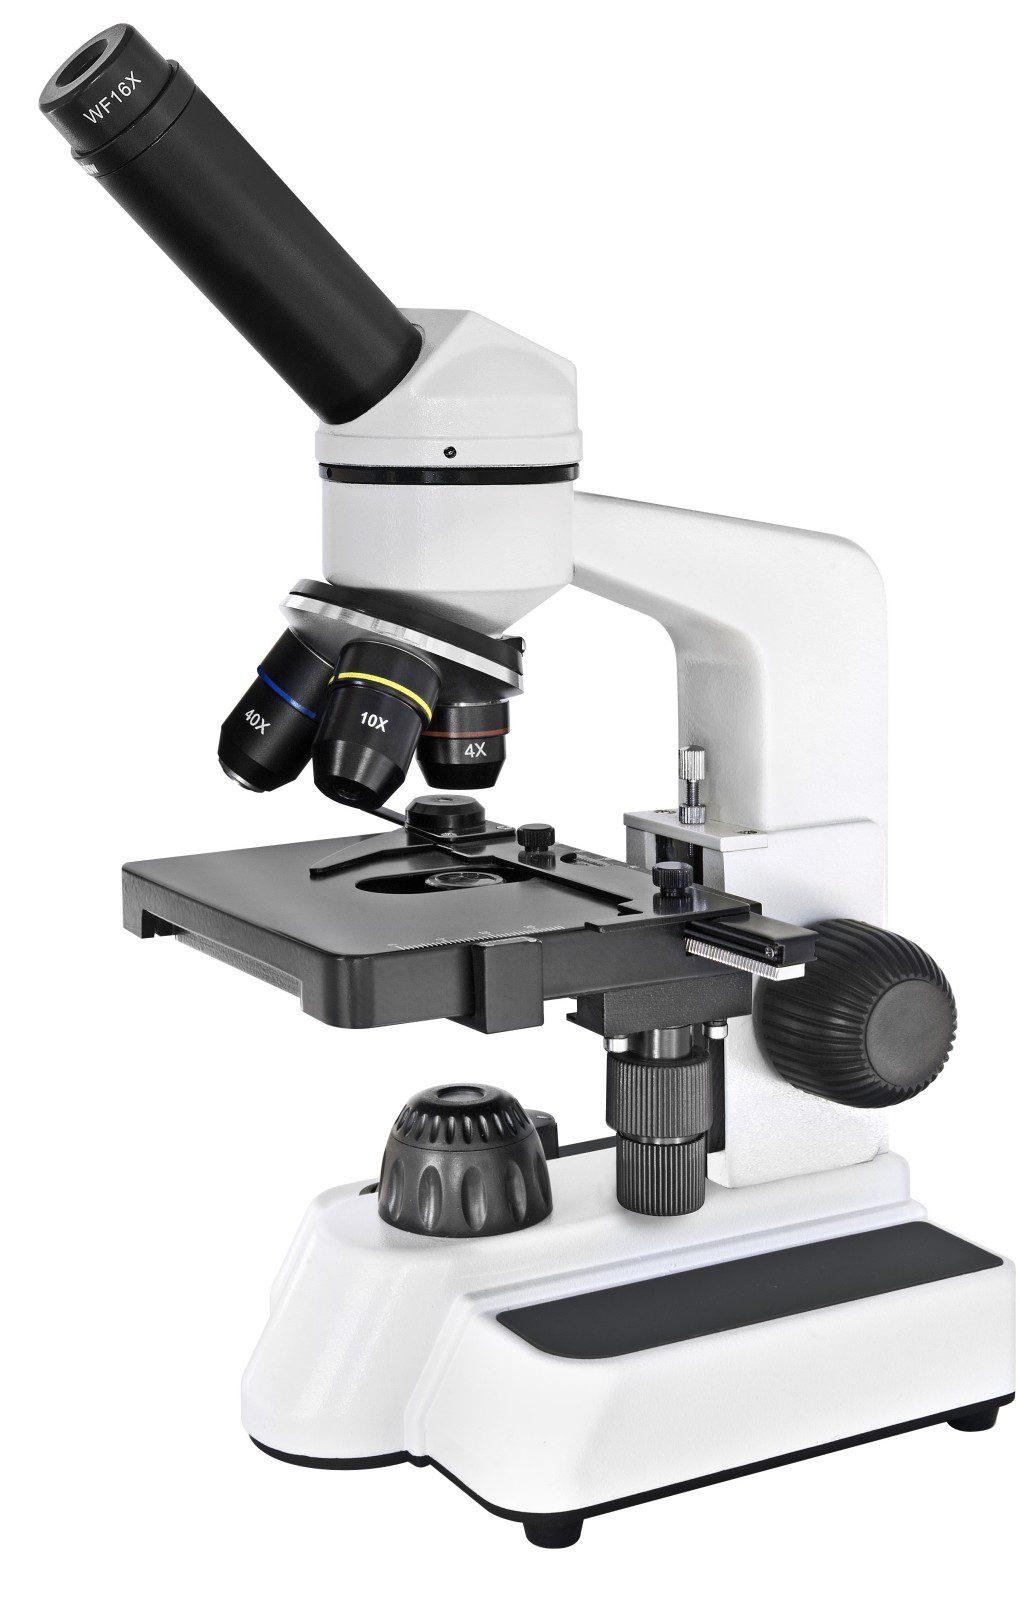 Mikroskop Bresser Biorit 20x - 1280x